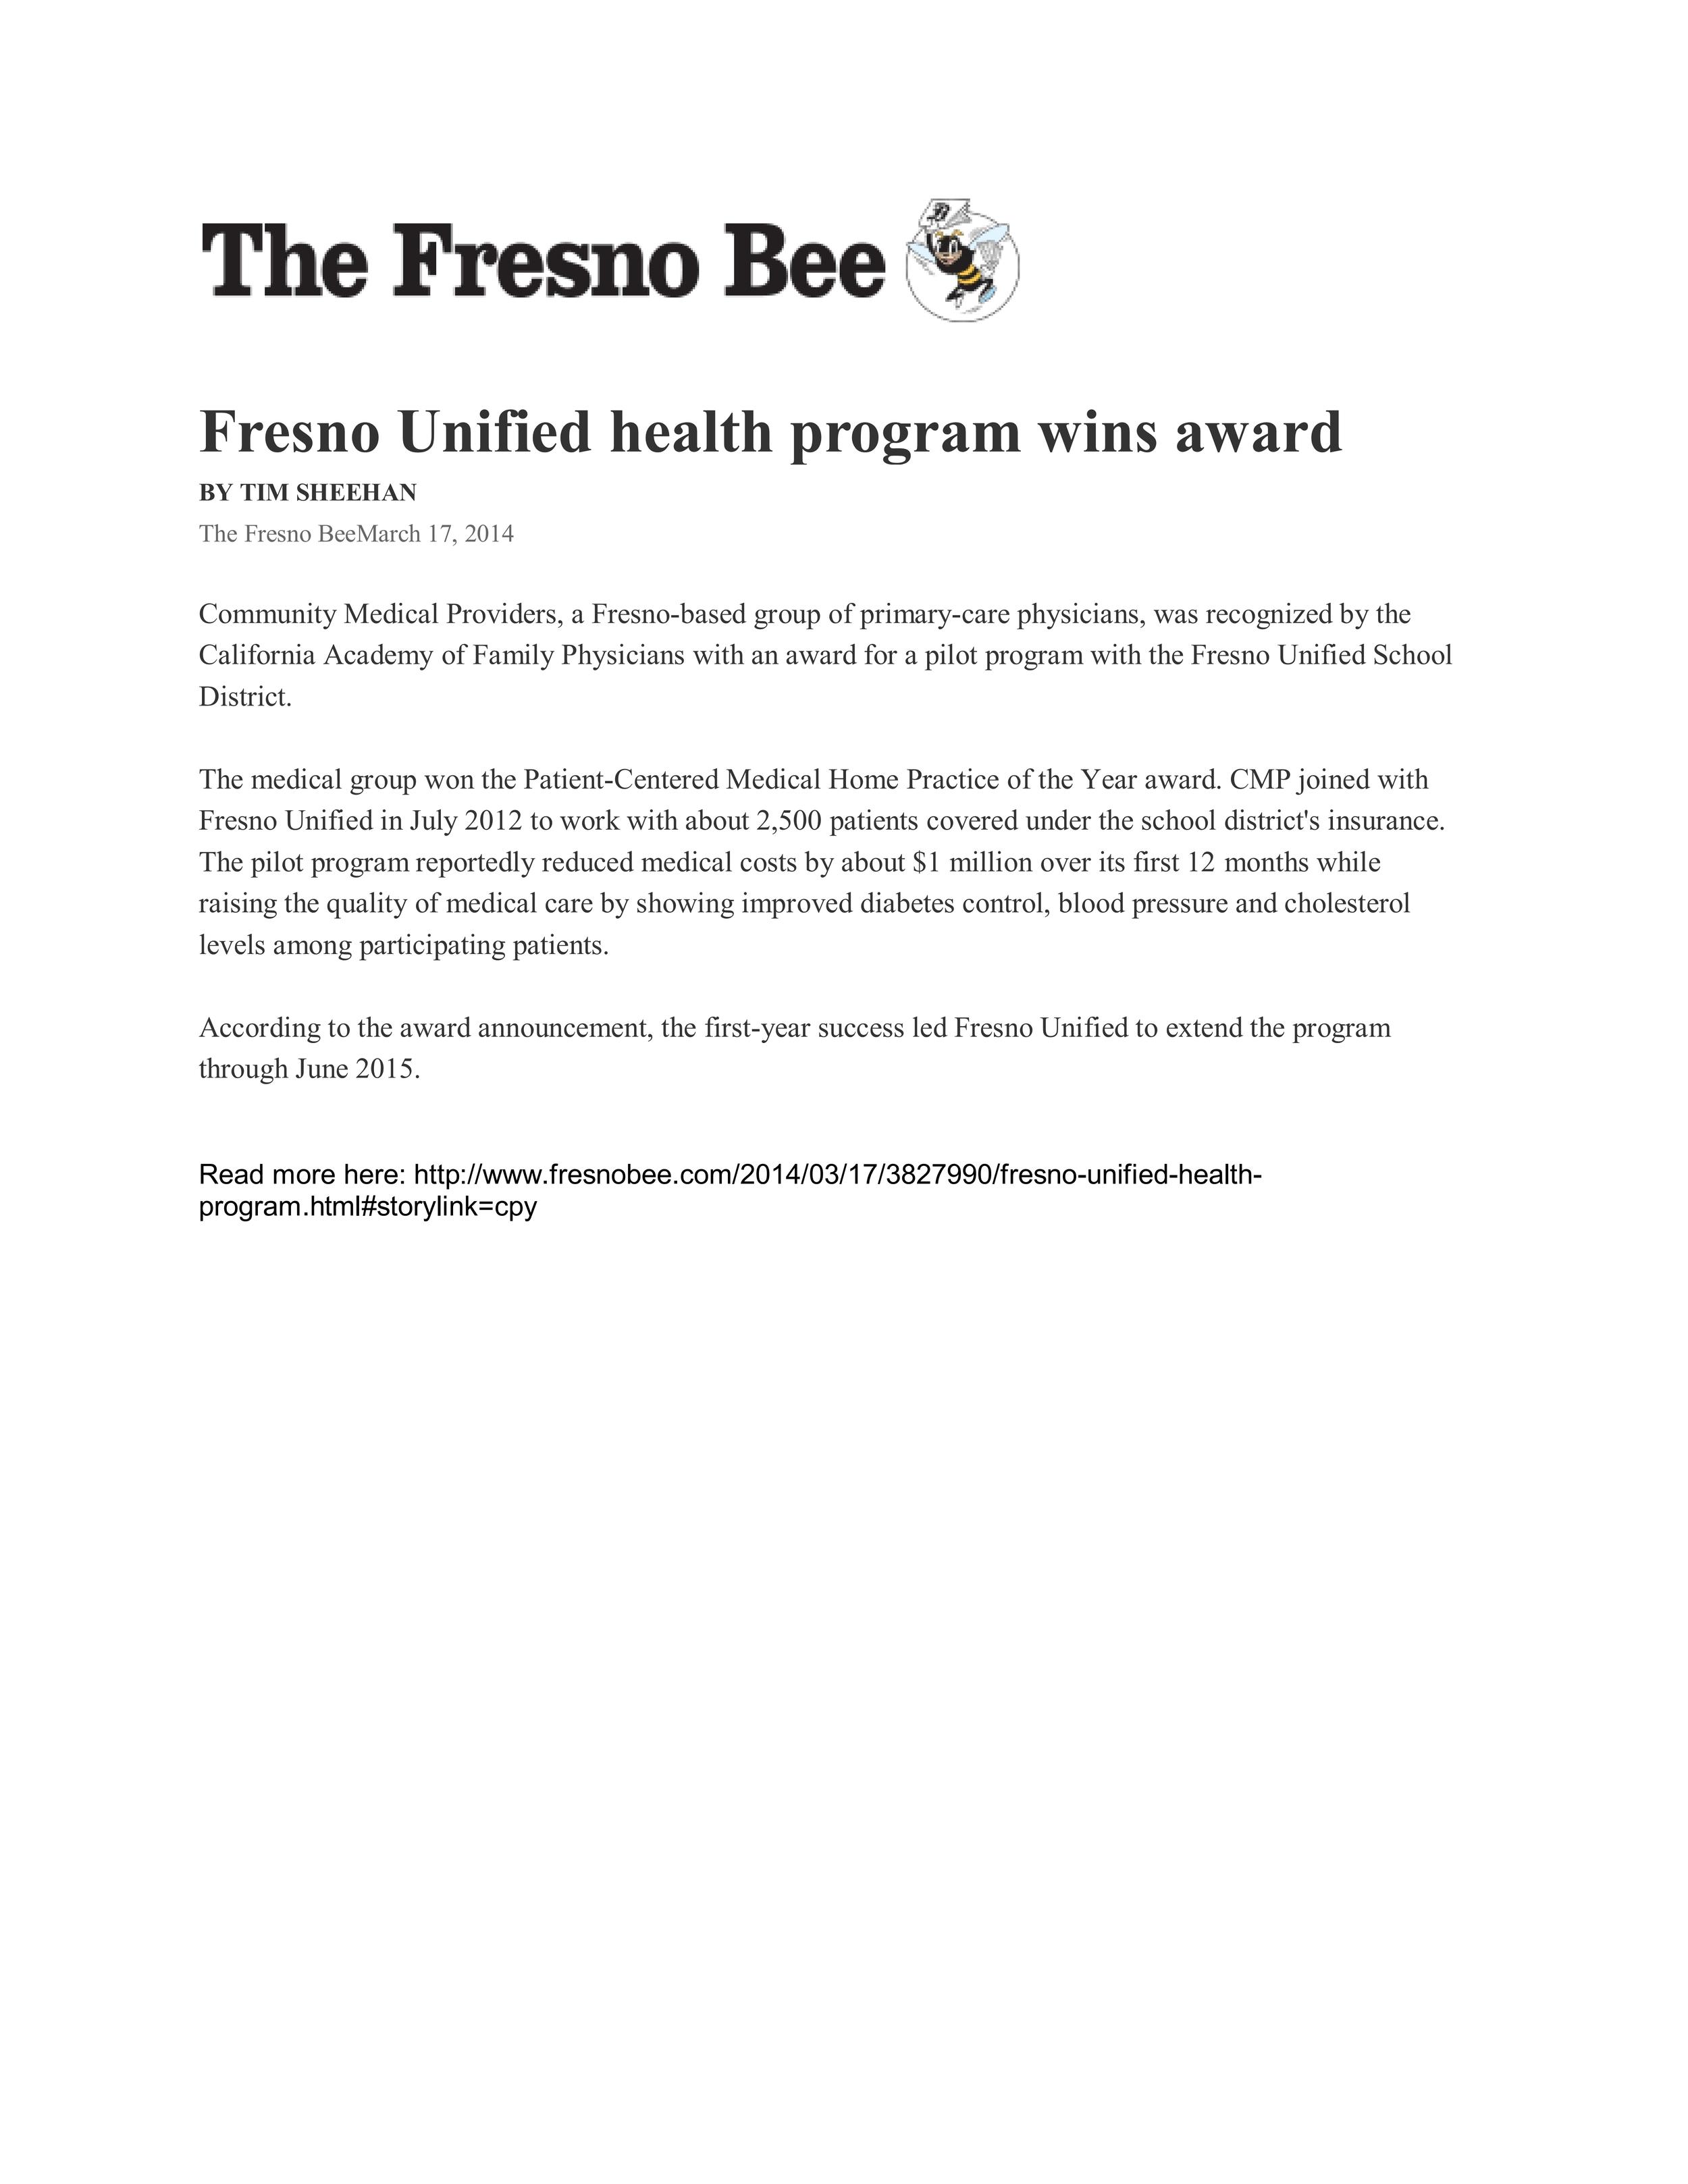 Fresno Bee - PCMH May 29, 2012_001.jpg